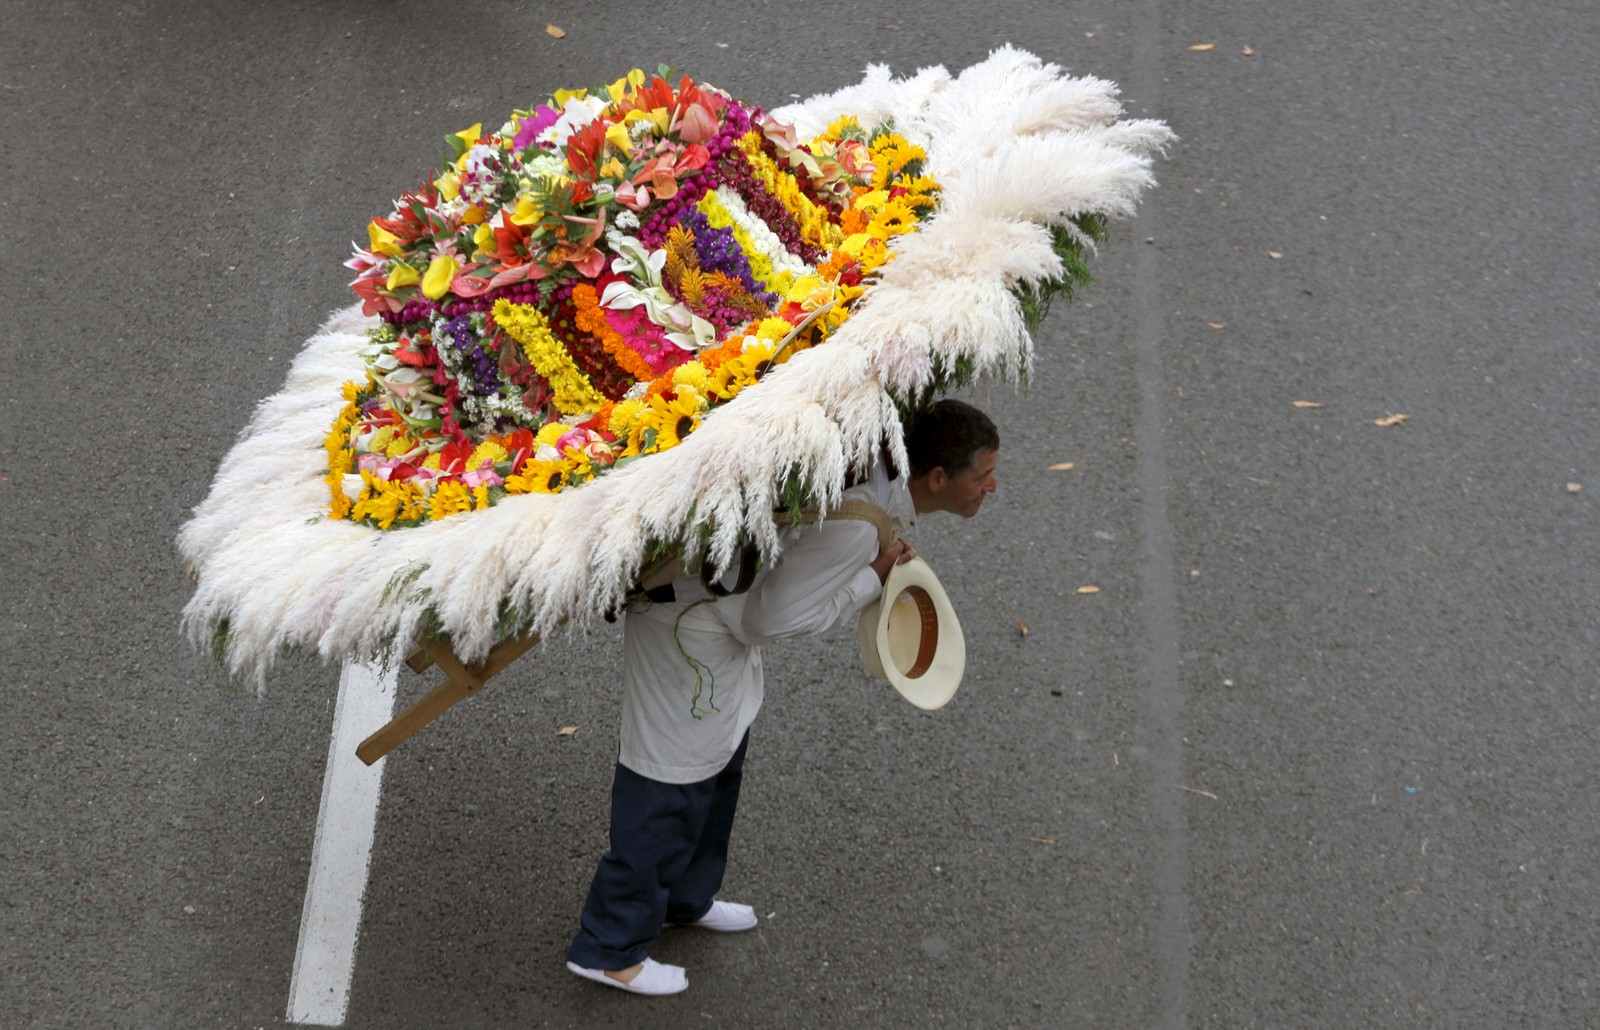 Denne mannen deltoki en blomsterparaden i Medellin, Colombia.